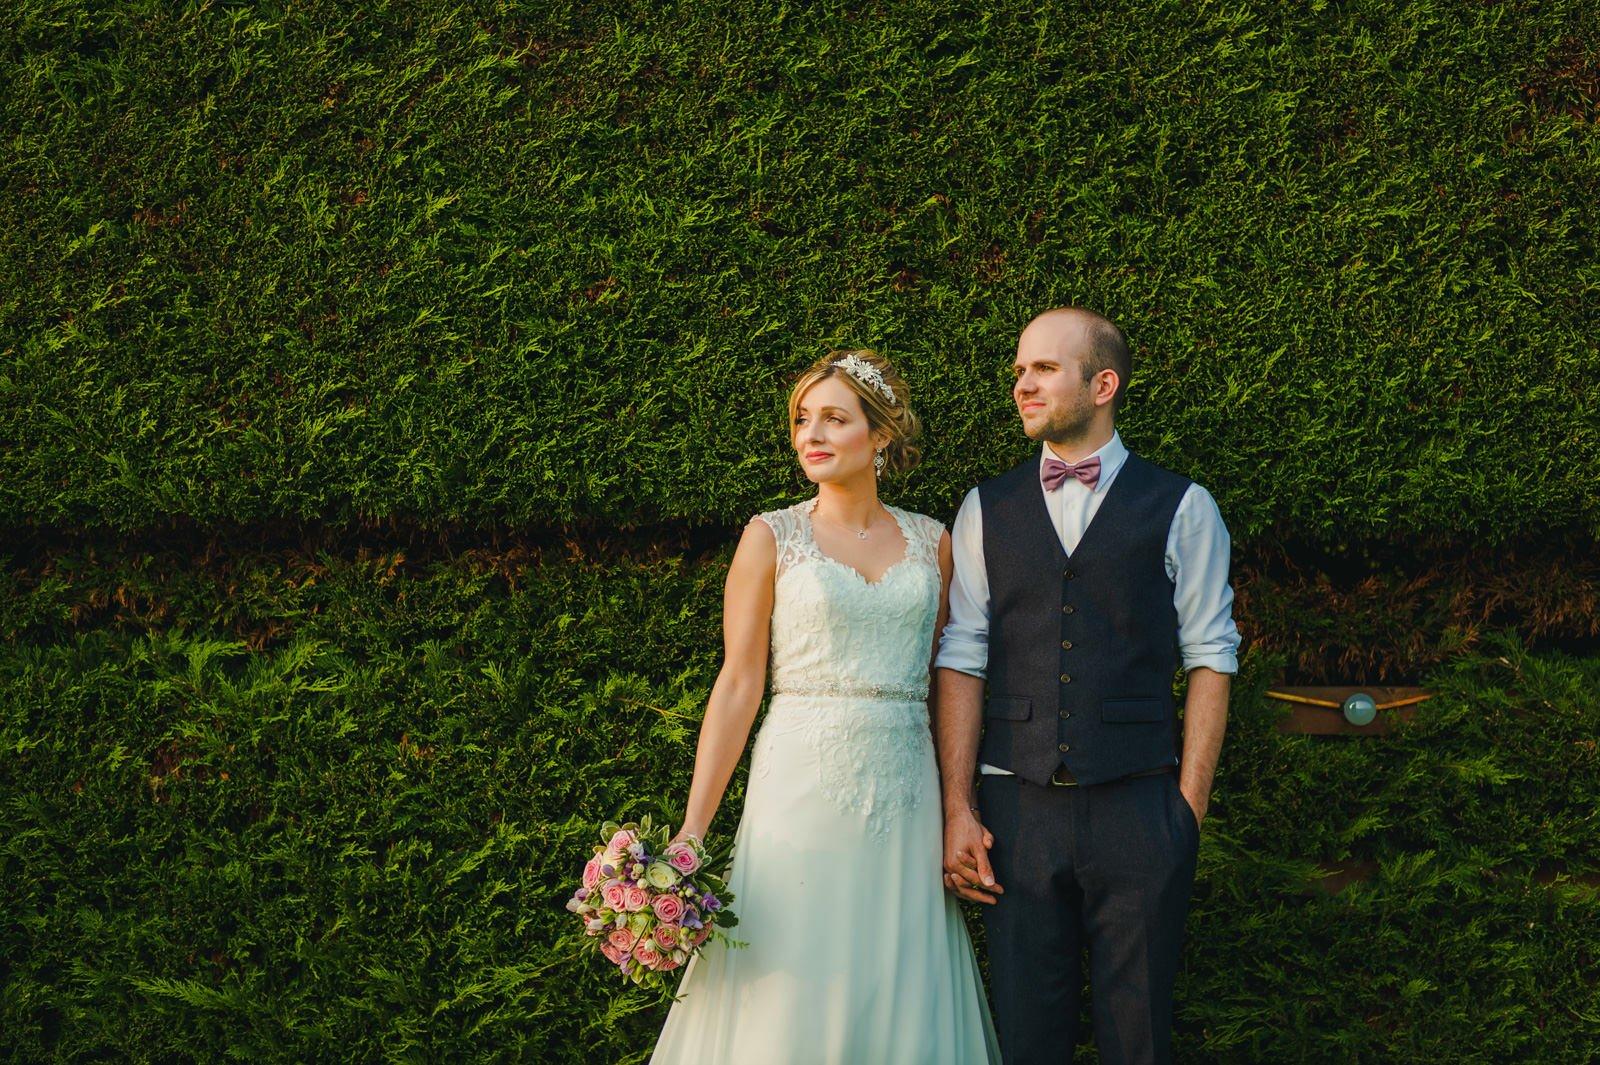 Millers Of Netley wedding, Dorrington, Shrewsbury | Emma + Ben 85